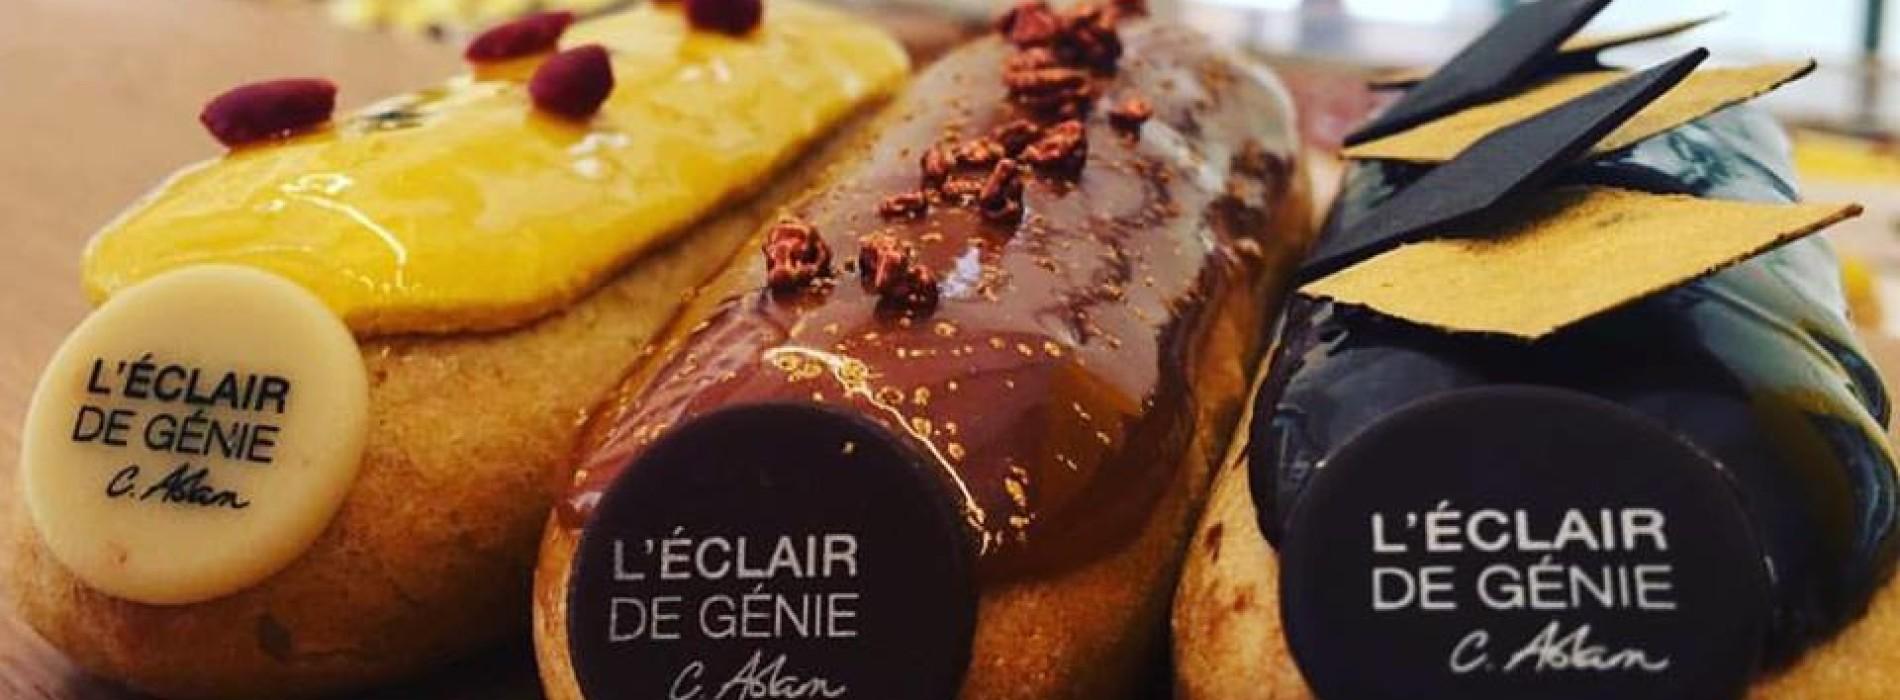 L'Éclair de Génie Milano, il bignè francese di Christophe Adam sbarca a Brera e Navigli